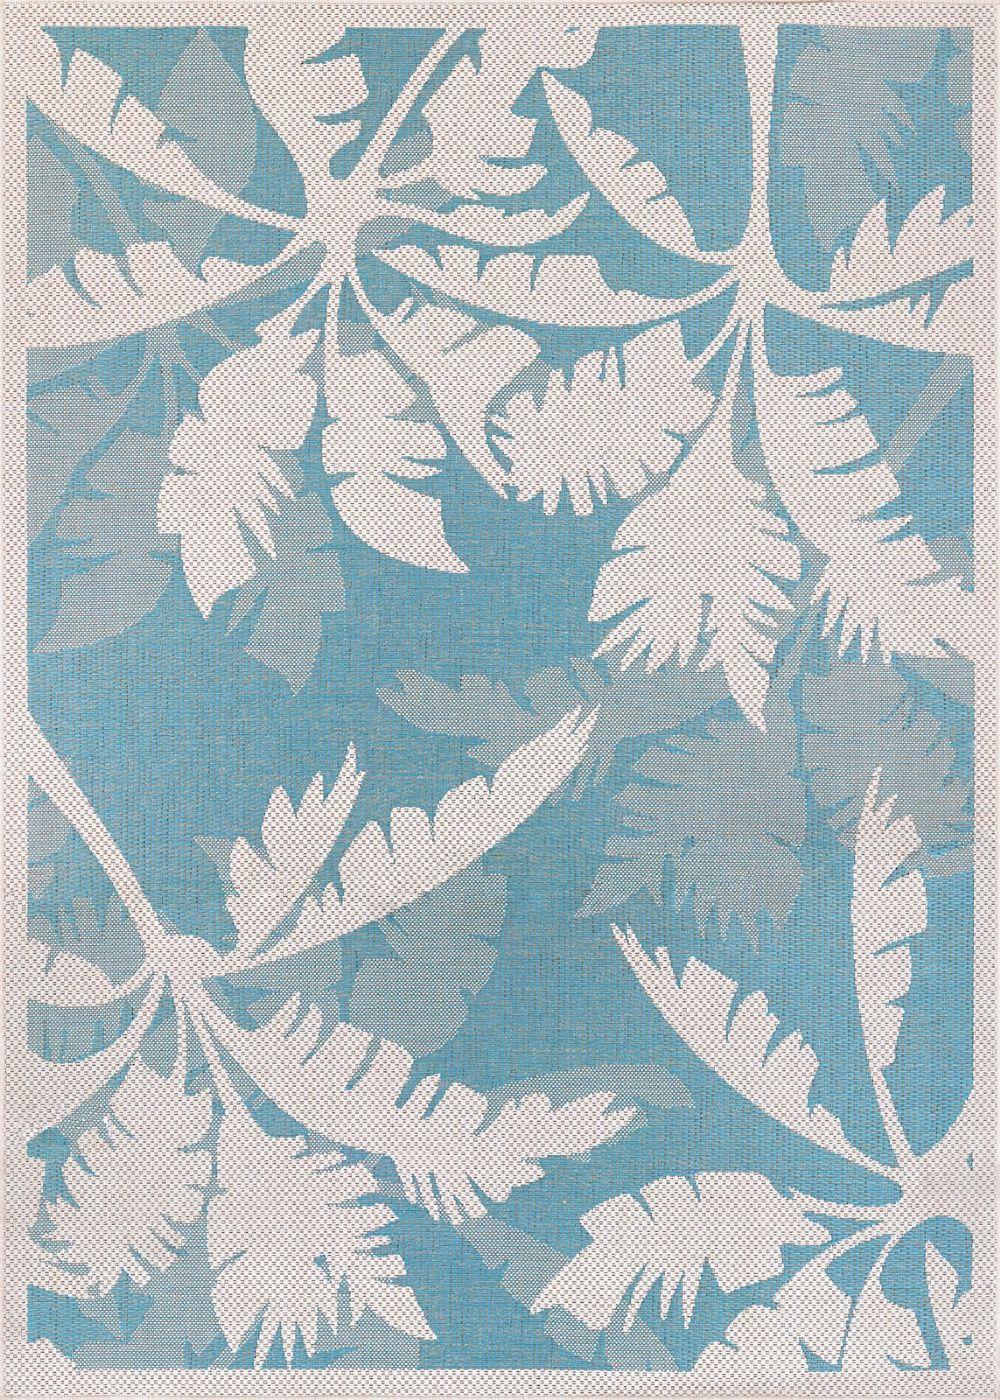 couristan monaco country & floral area rug collection